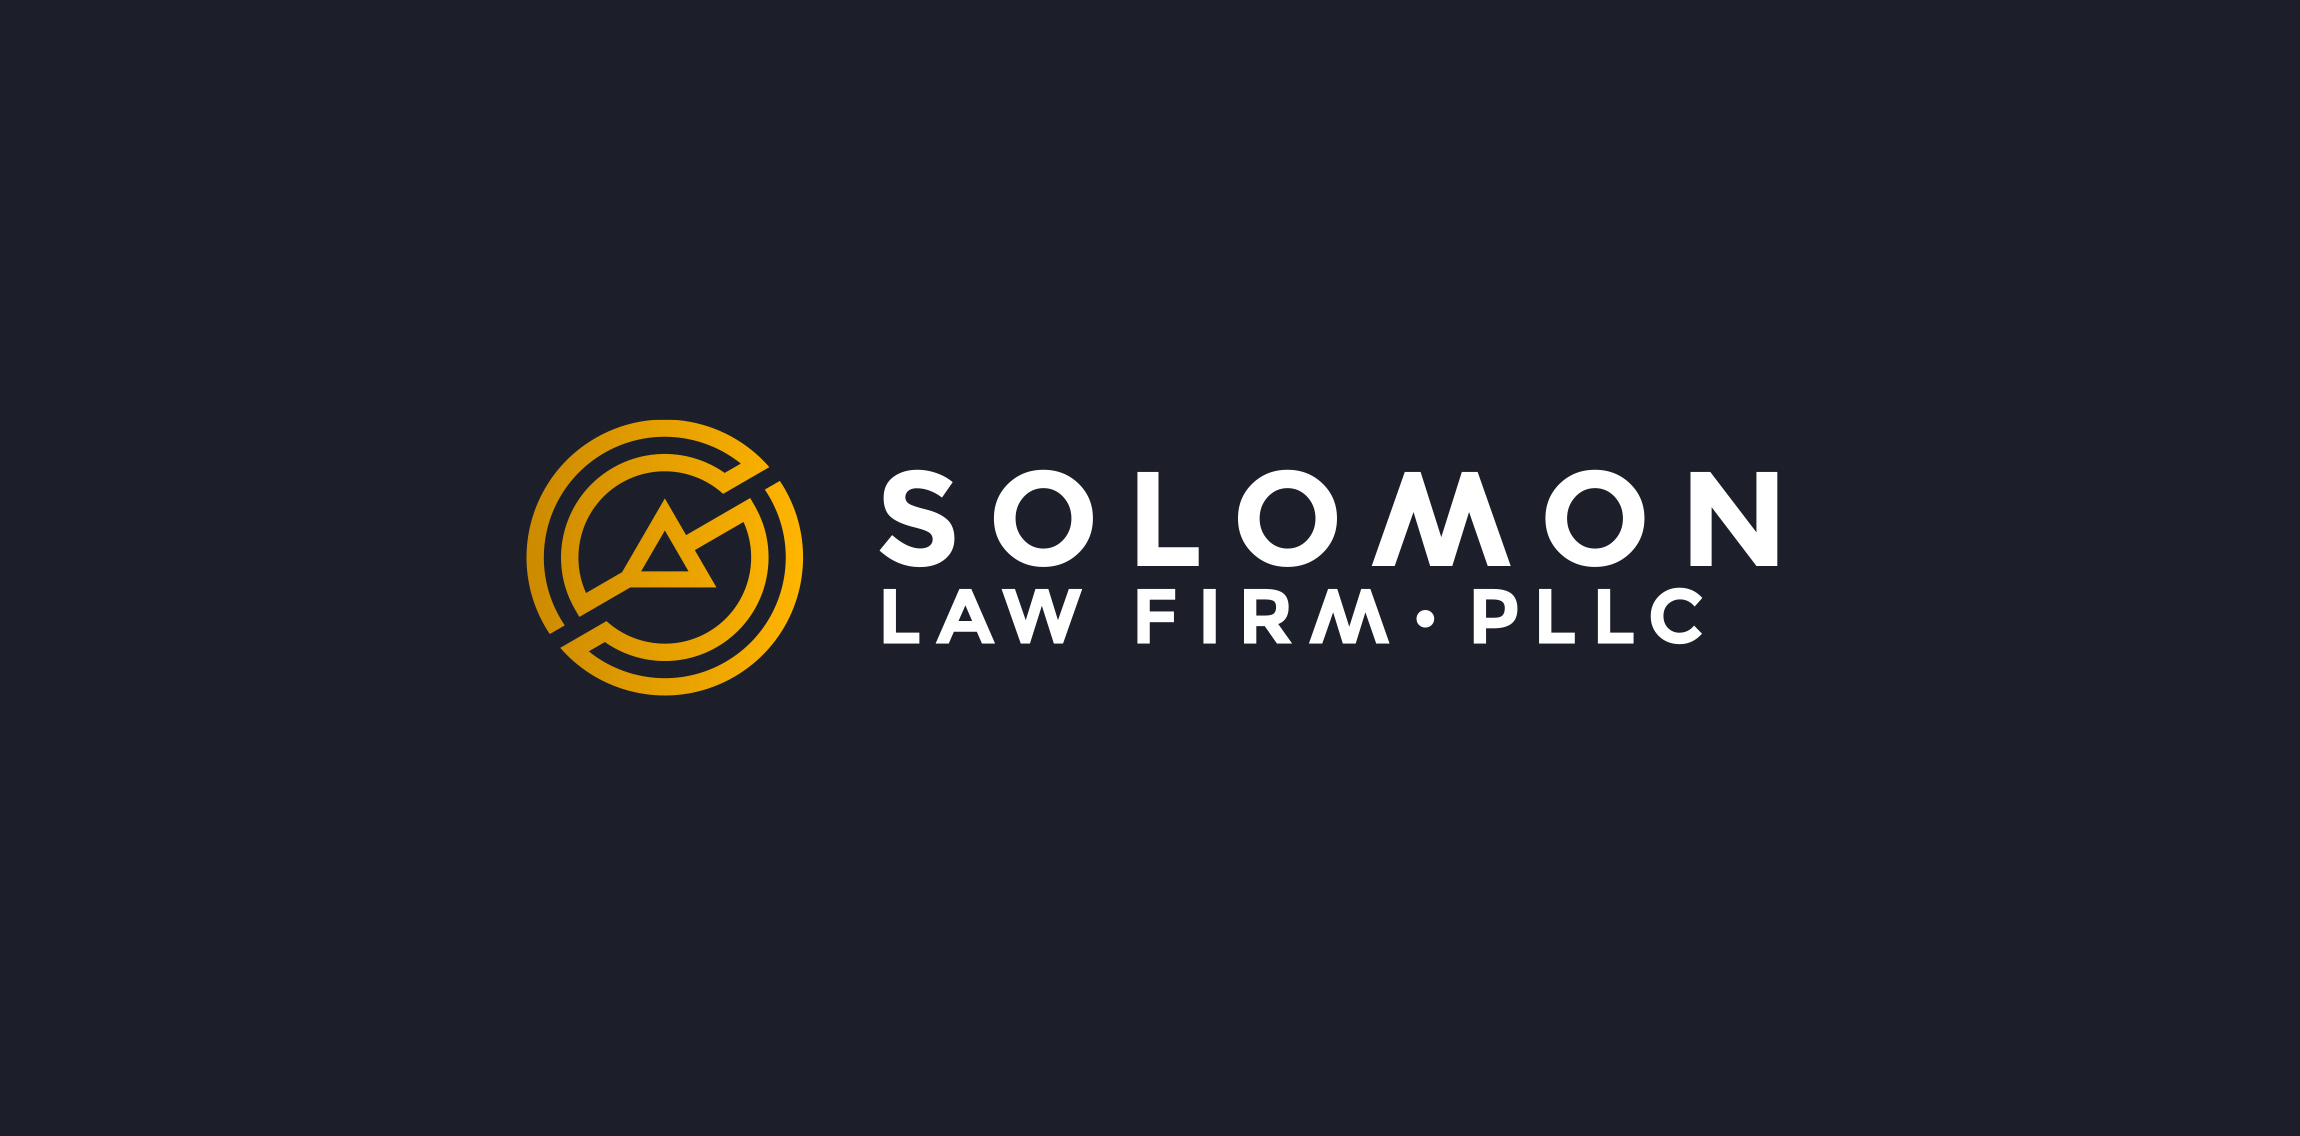 Solomon Law Firm